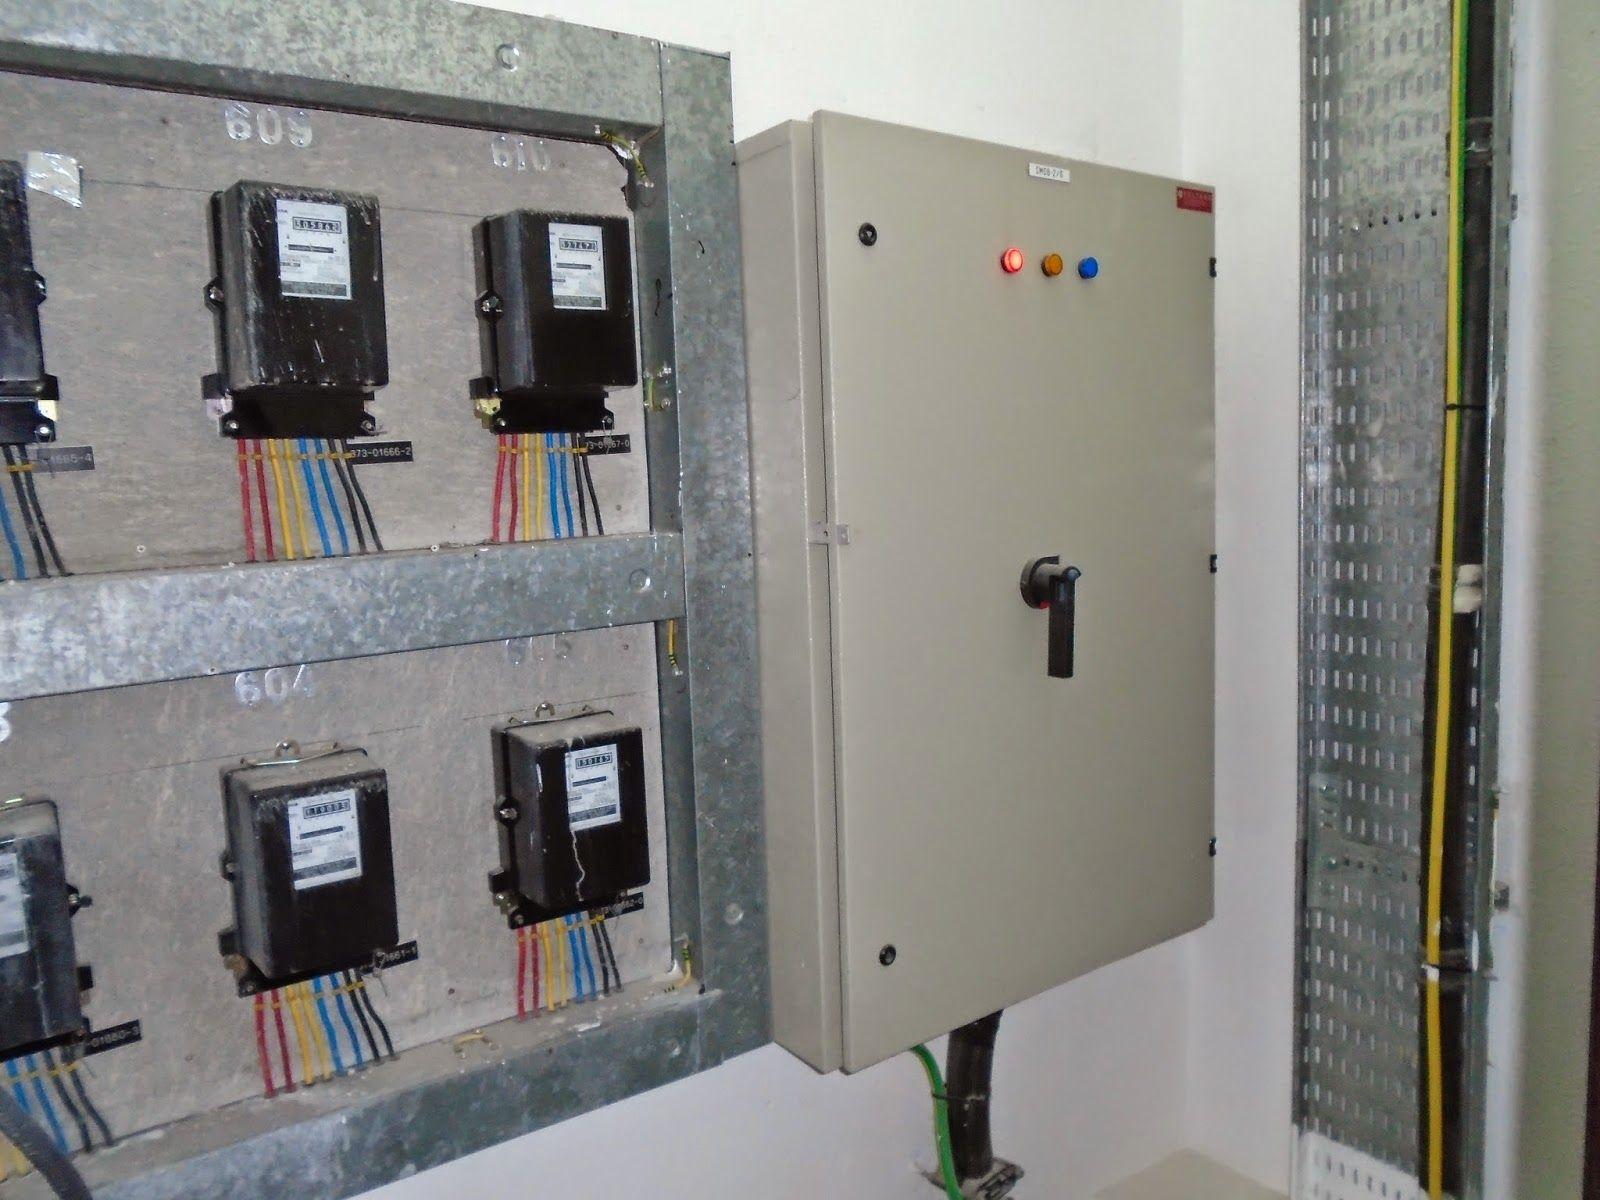 medium resolution of electrical wiring in bangladesh smdb and meter basic basic home electrical wiring diagram